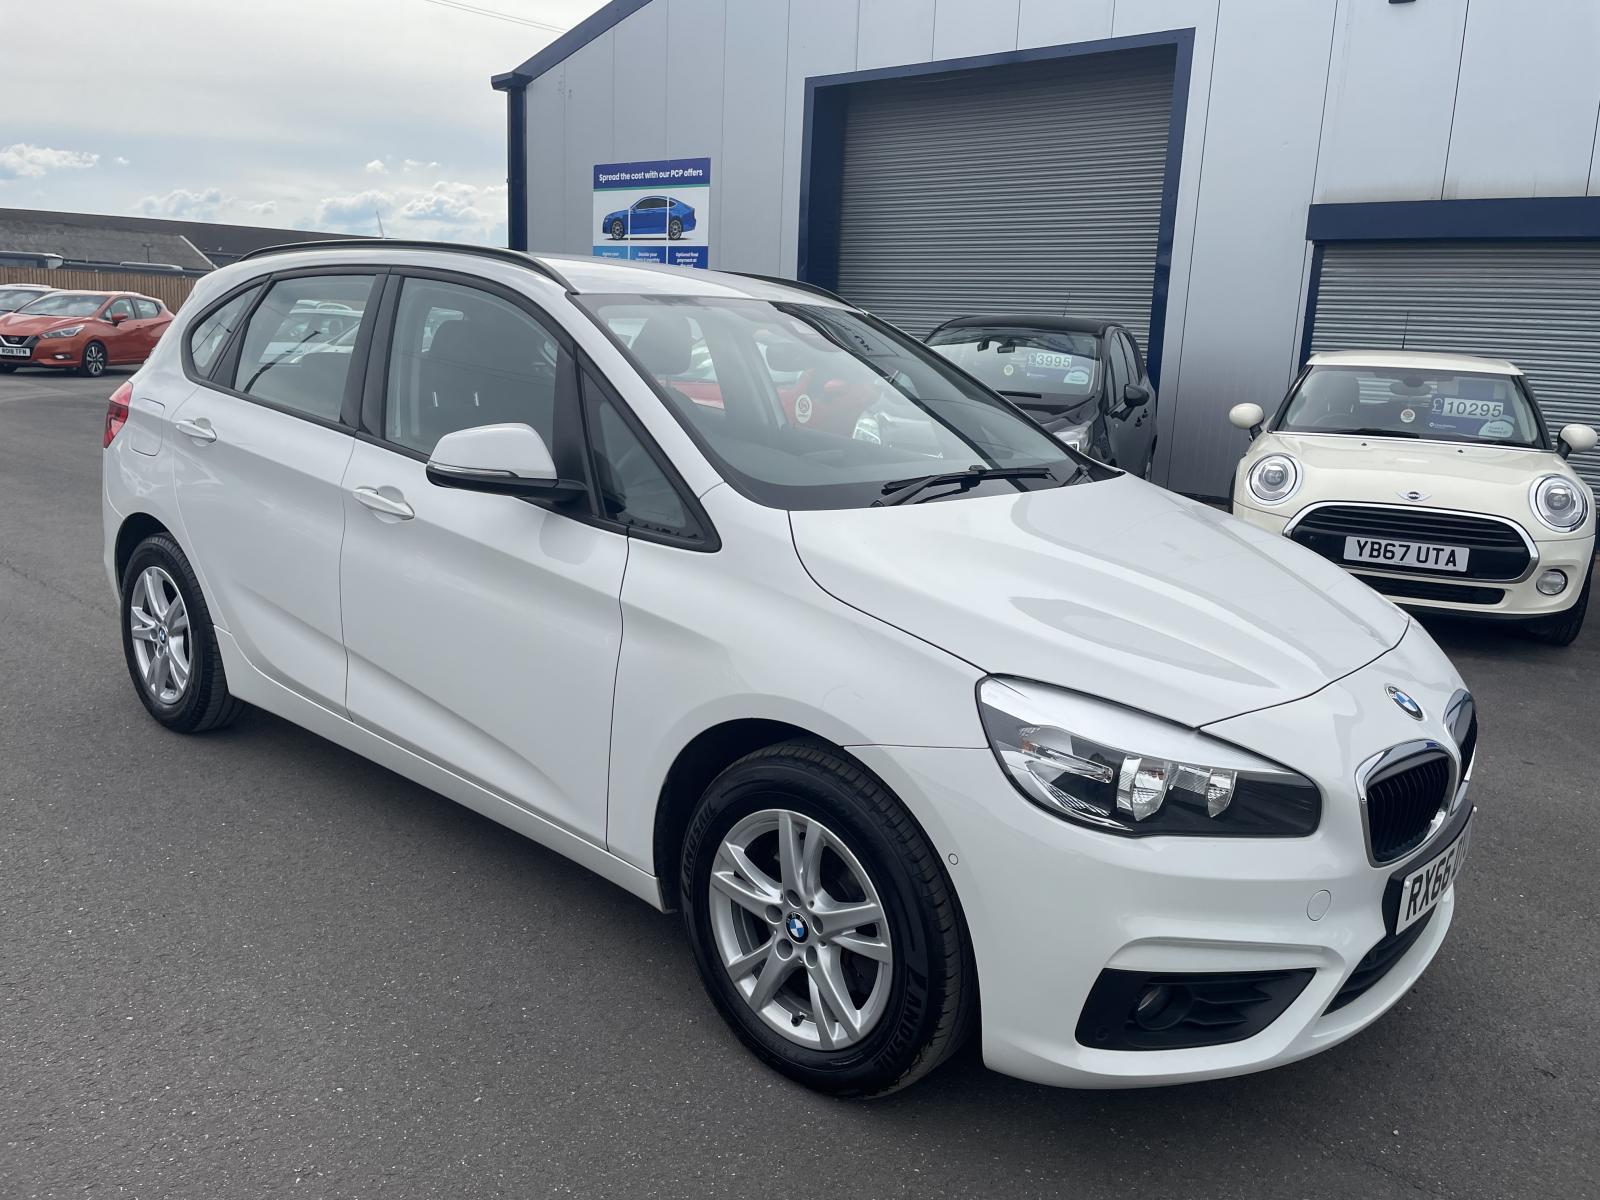 2016 BMW 2 SERIES MK1 (F45) 2014 TO 2018 218D SPORT ACTIVE TOURER